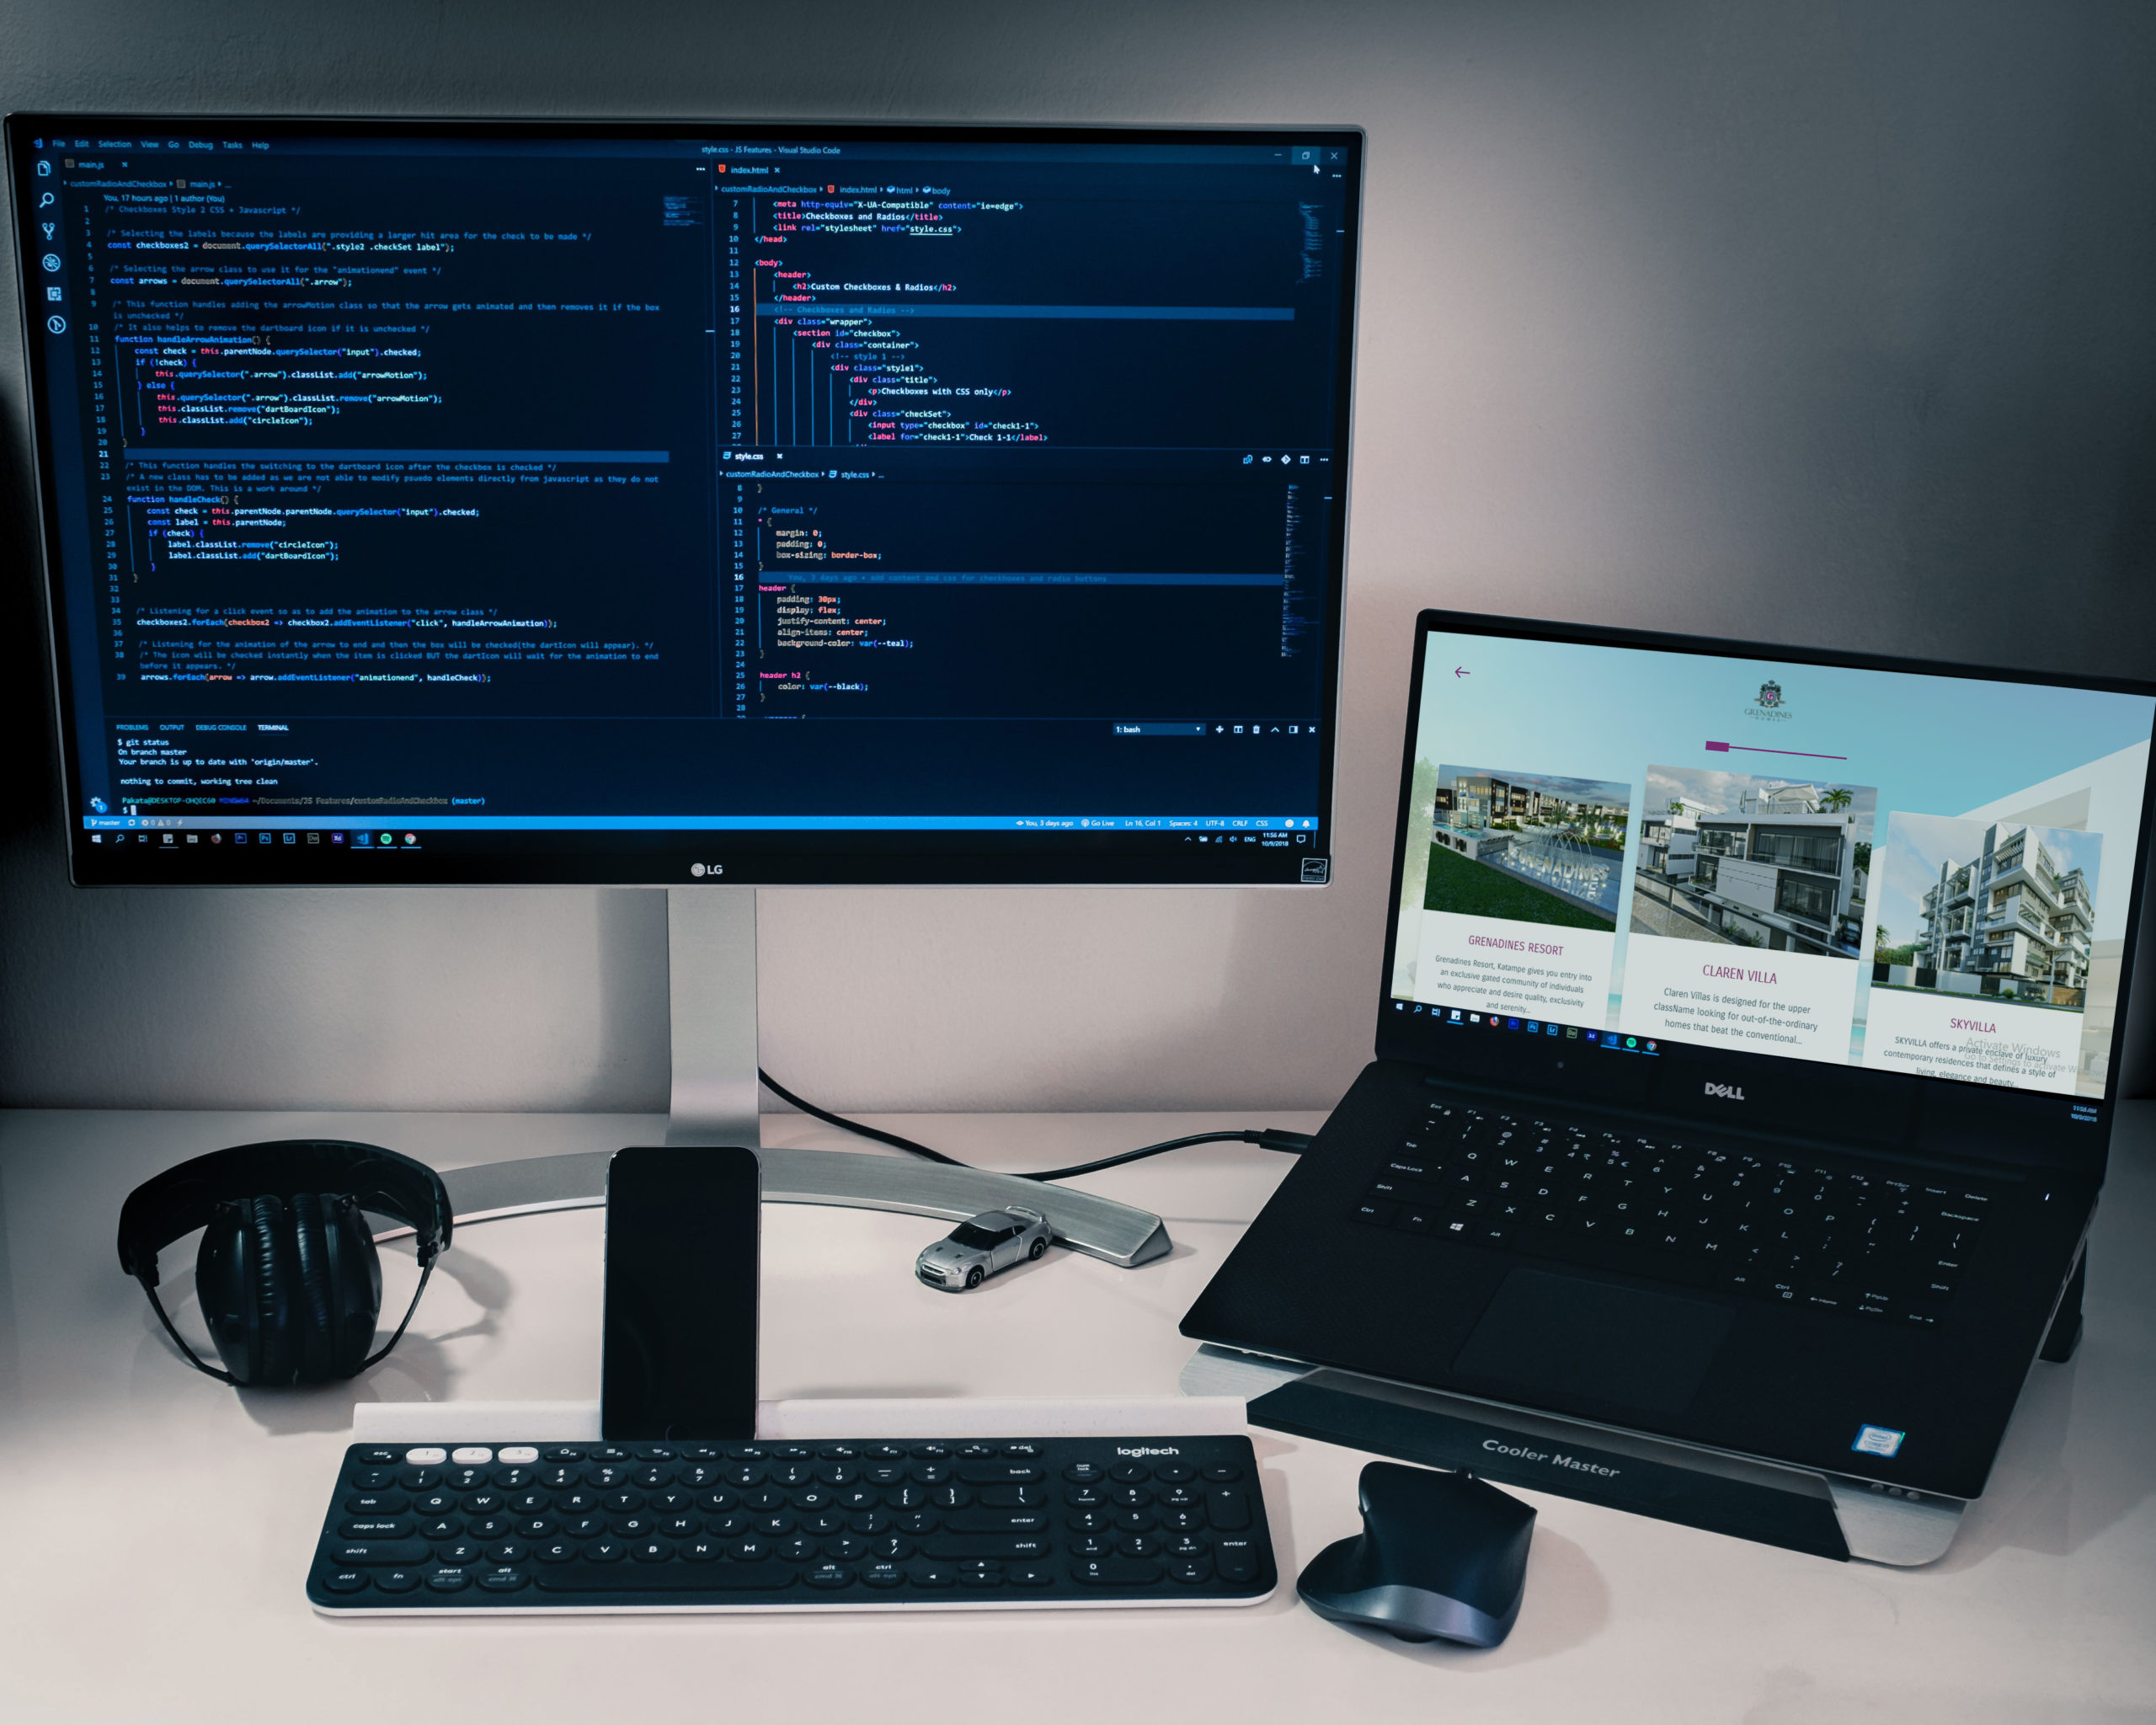 https://evaluate.ng/wp-content/uploads/2021/08/Software-Dev-scaled.jpg